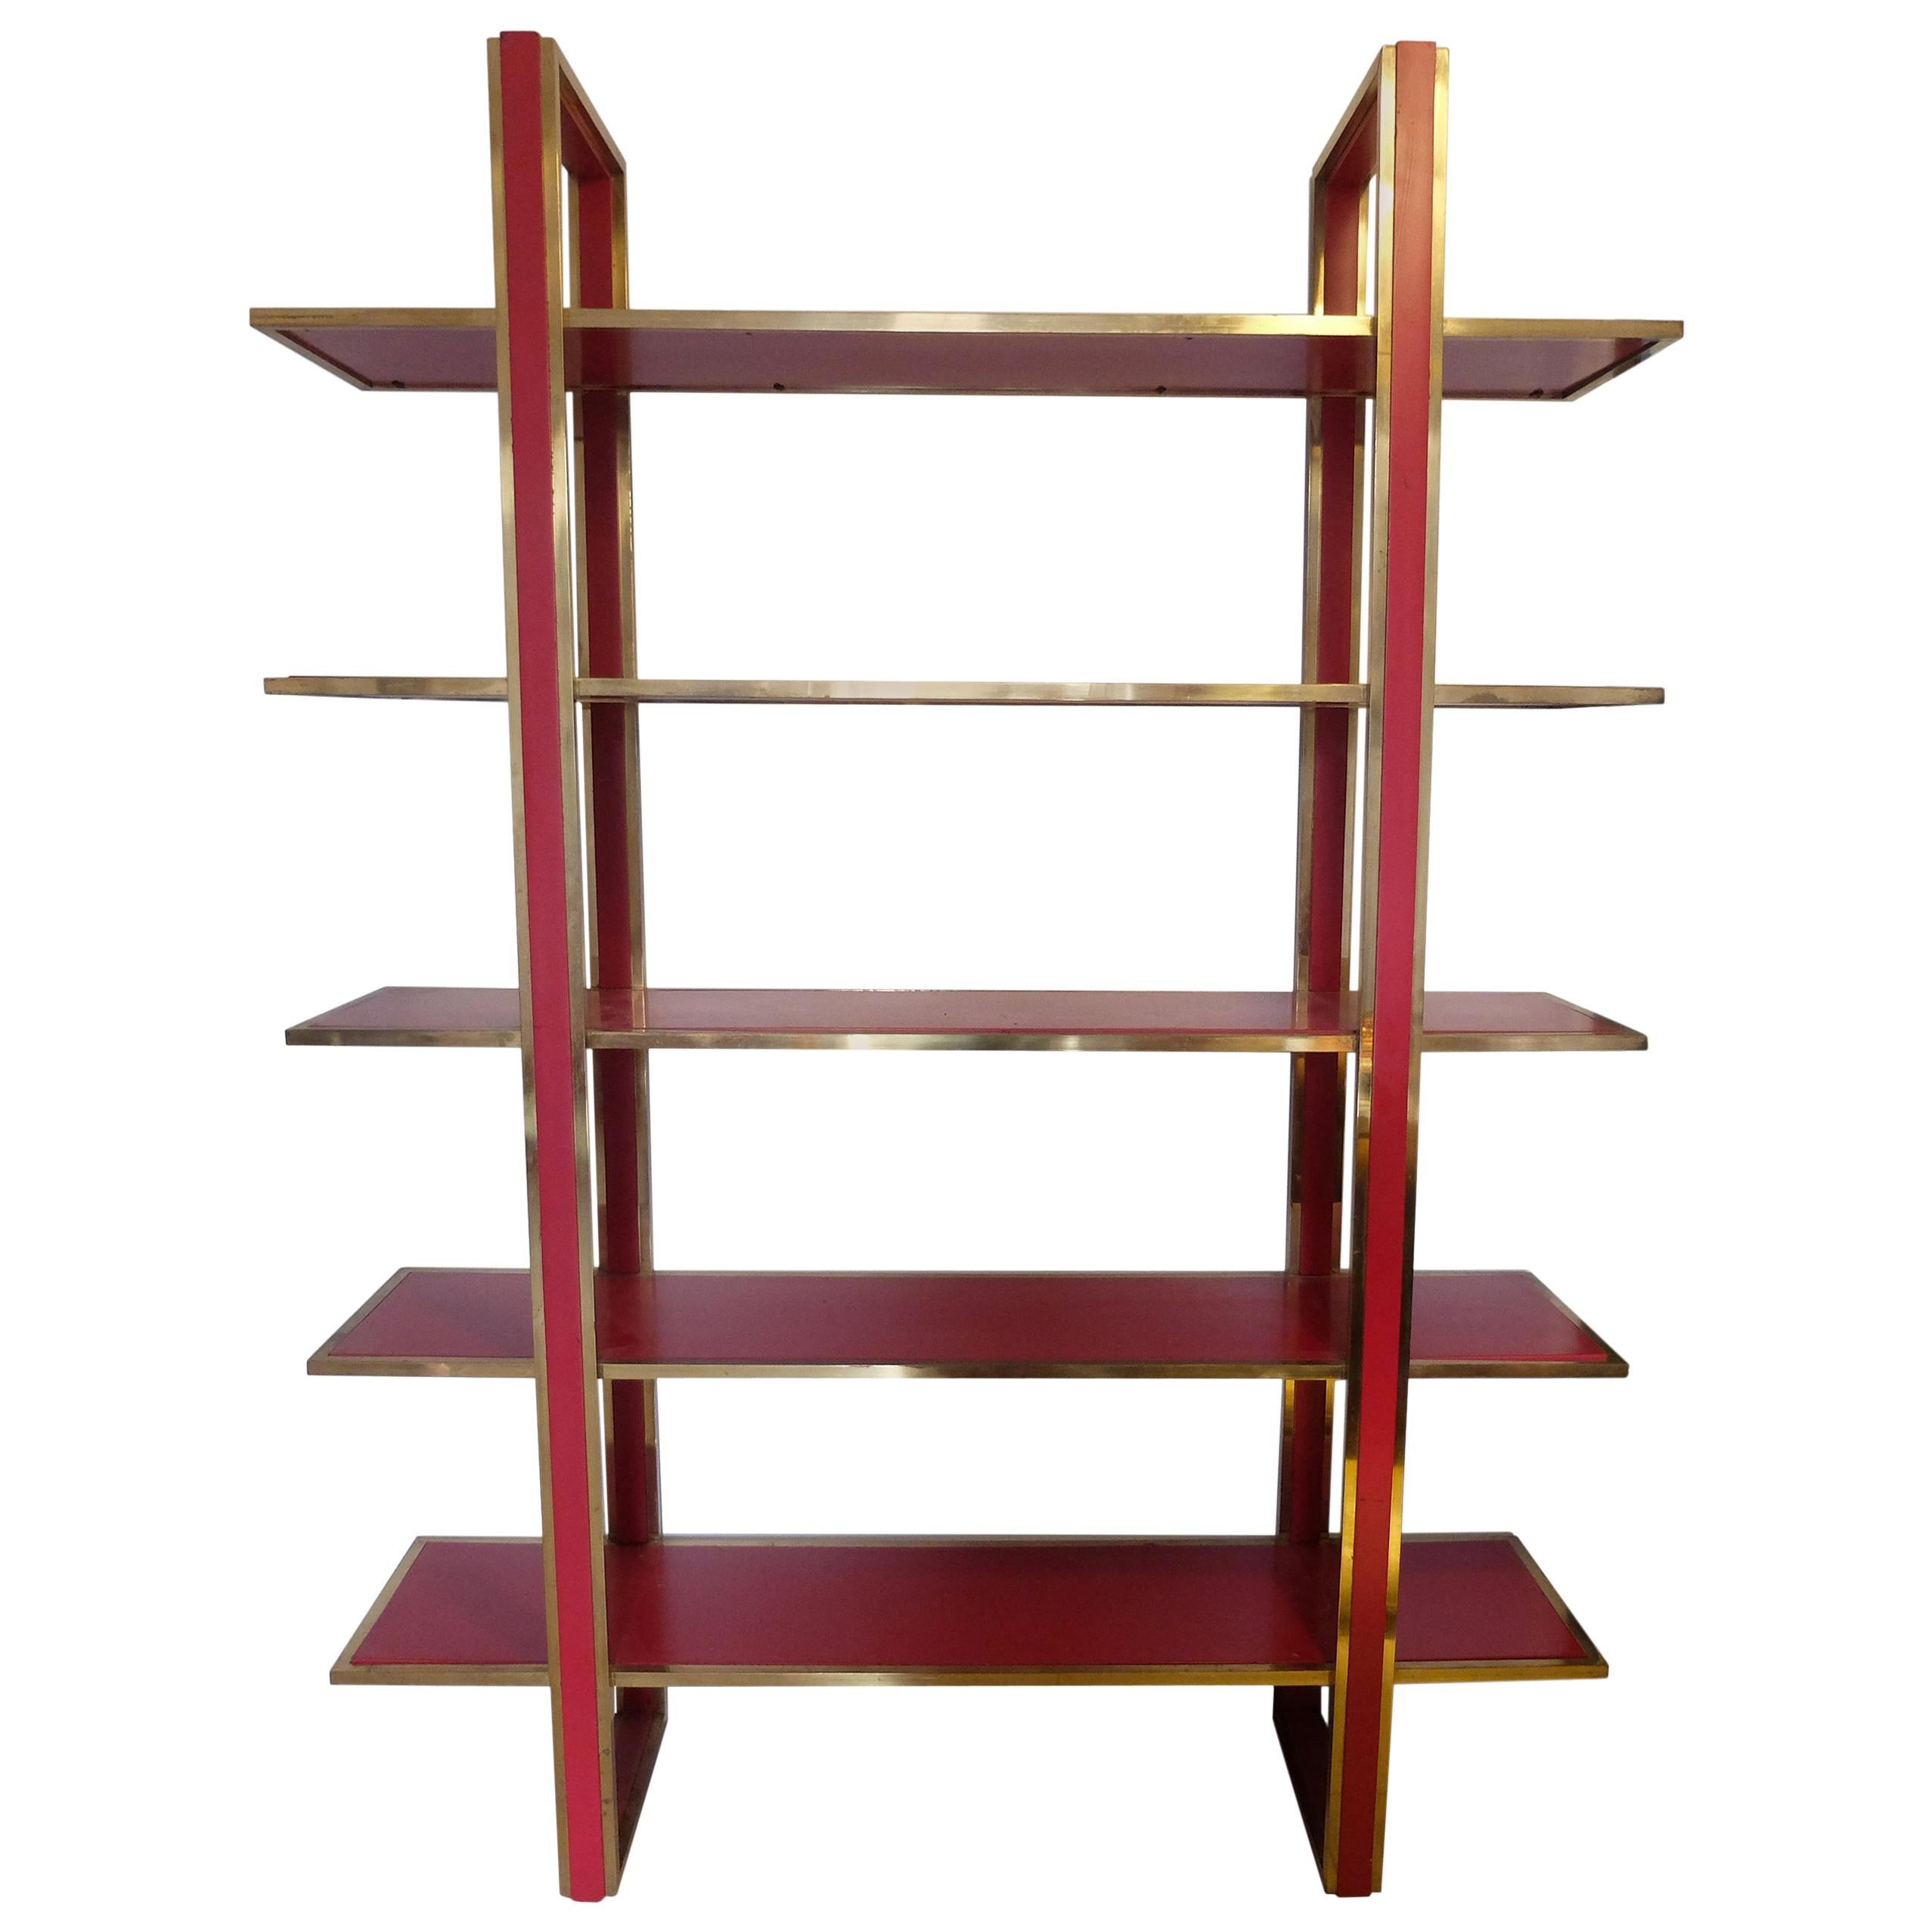 Italian Mid-Century Bookshelf in Brass and Red Lacquered Wood, Romeo Rega, 1970s